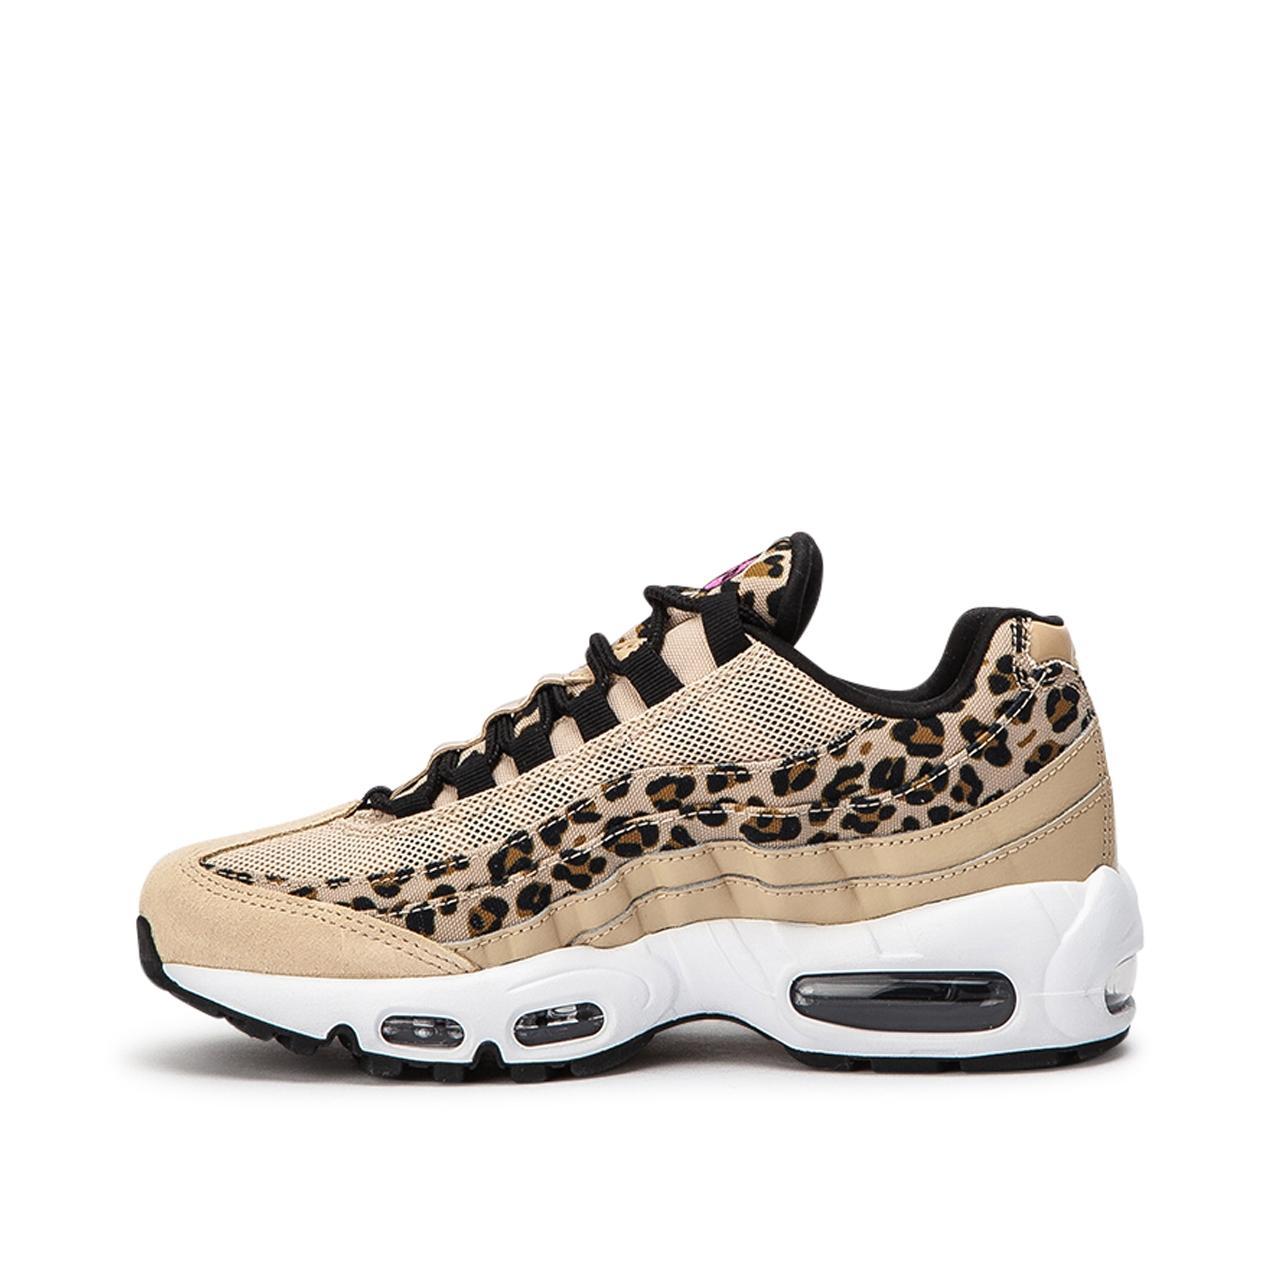 sports shoes bf395 24c04 ... Nike Wmns Air Max 95 Prm